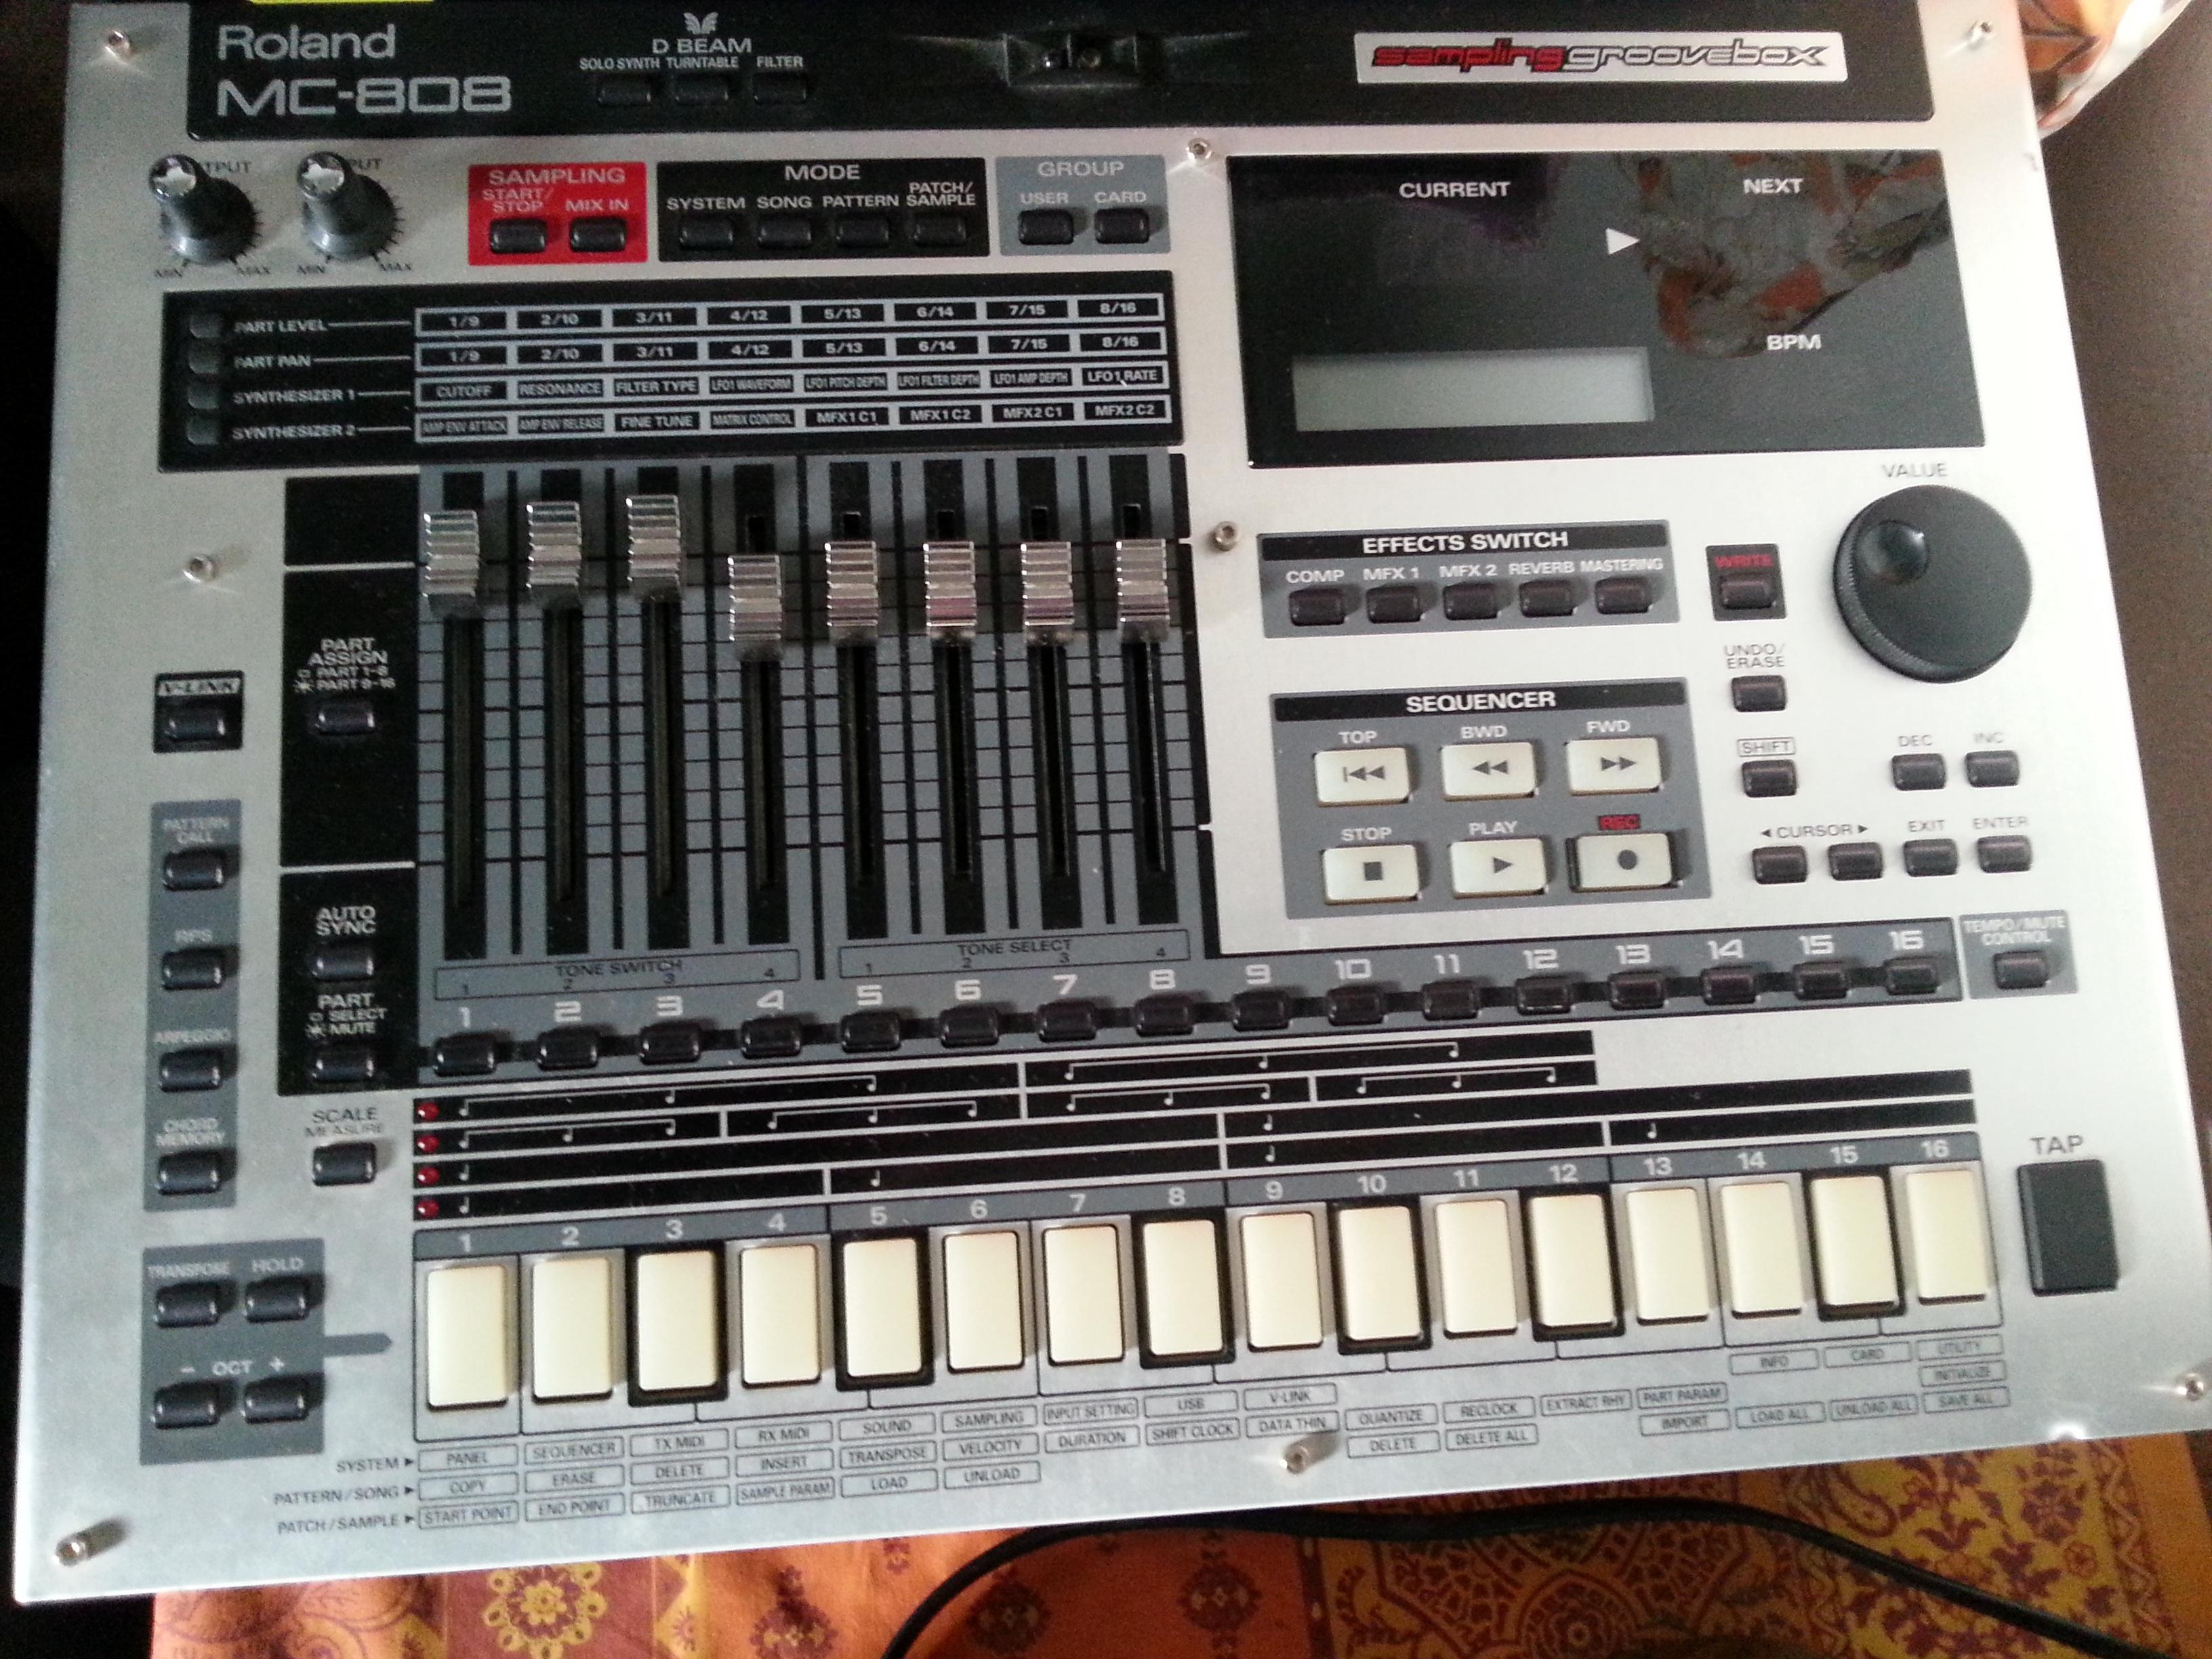 Roland MC-808 image (#1073051) - Audiofanzine